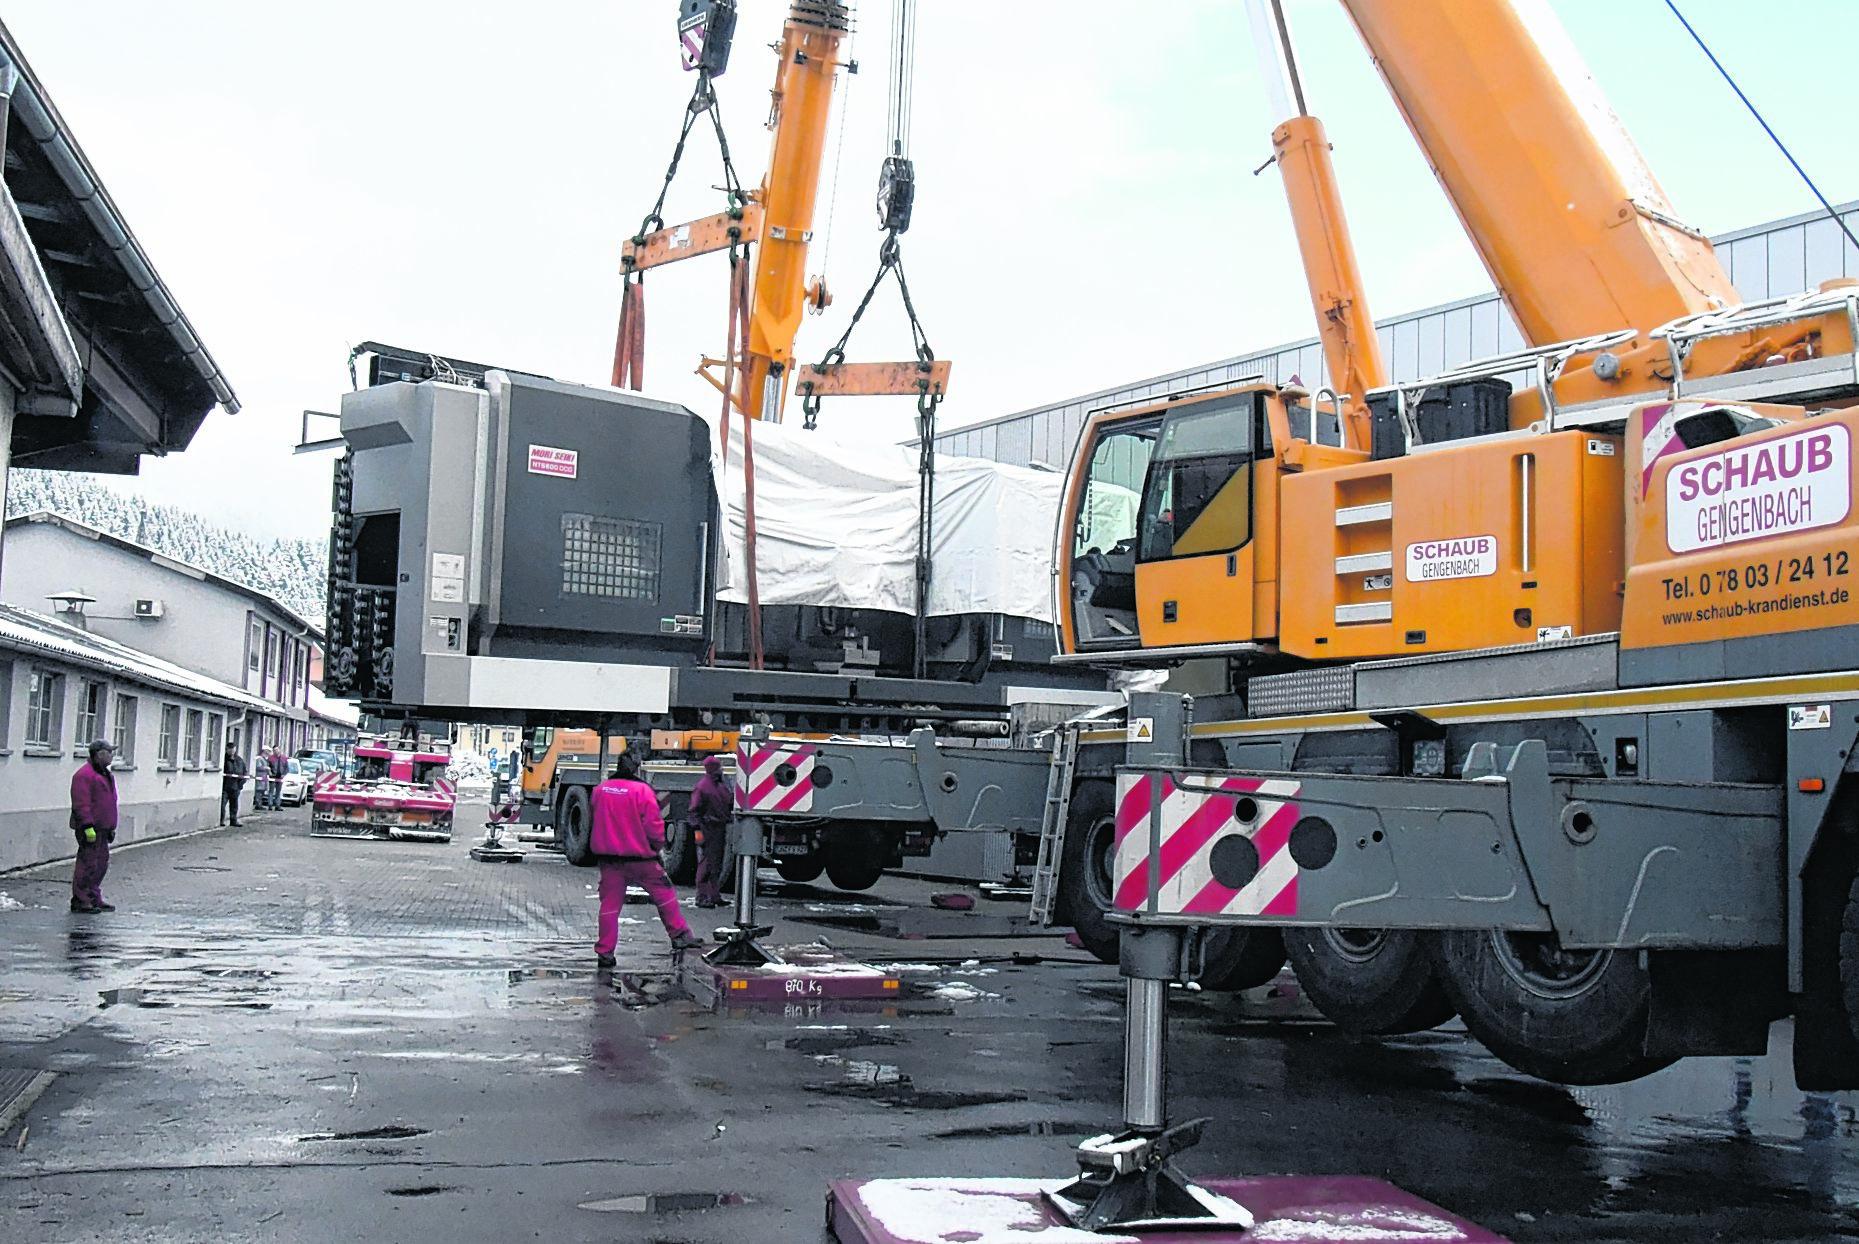 Schaub Gengenbach kinzigtal hengstler zylinder hausach 55 tonnen maschine löst